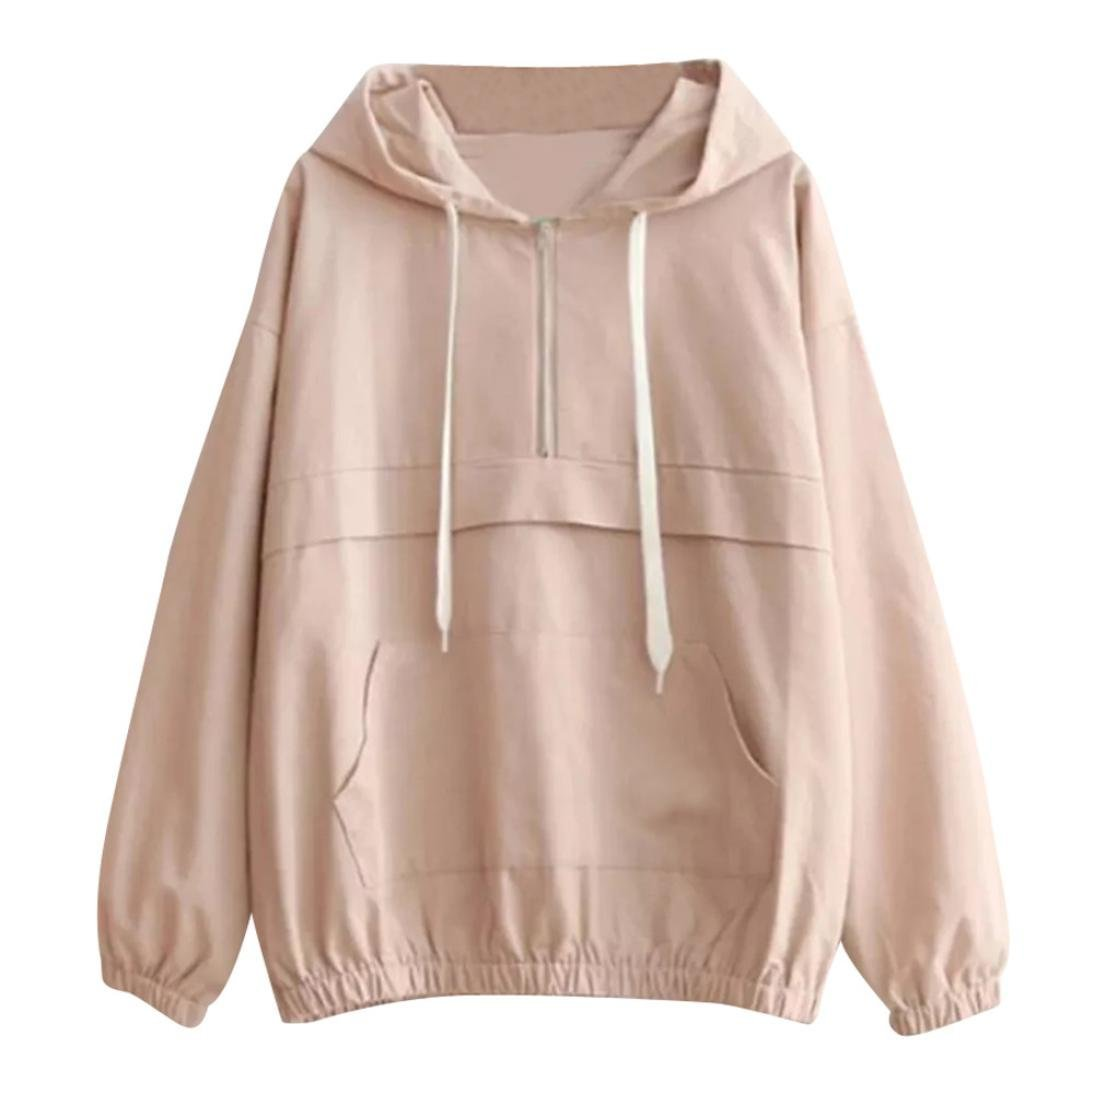 Clearance Thin Sweatshirt, Sttech1 Women Long Sleeve Hooded Sweatshirt Blouse with Zipper Pockets (S, Pink)